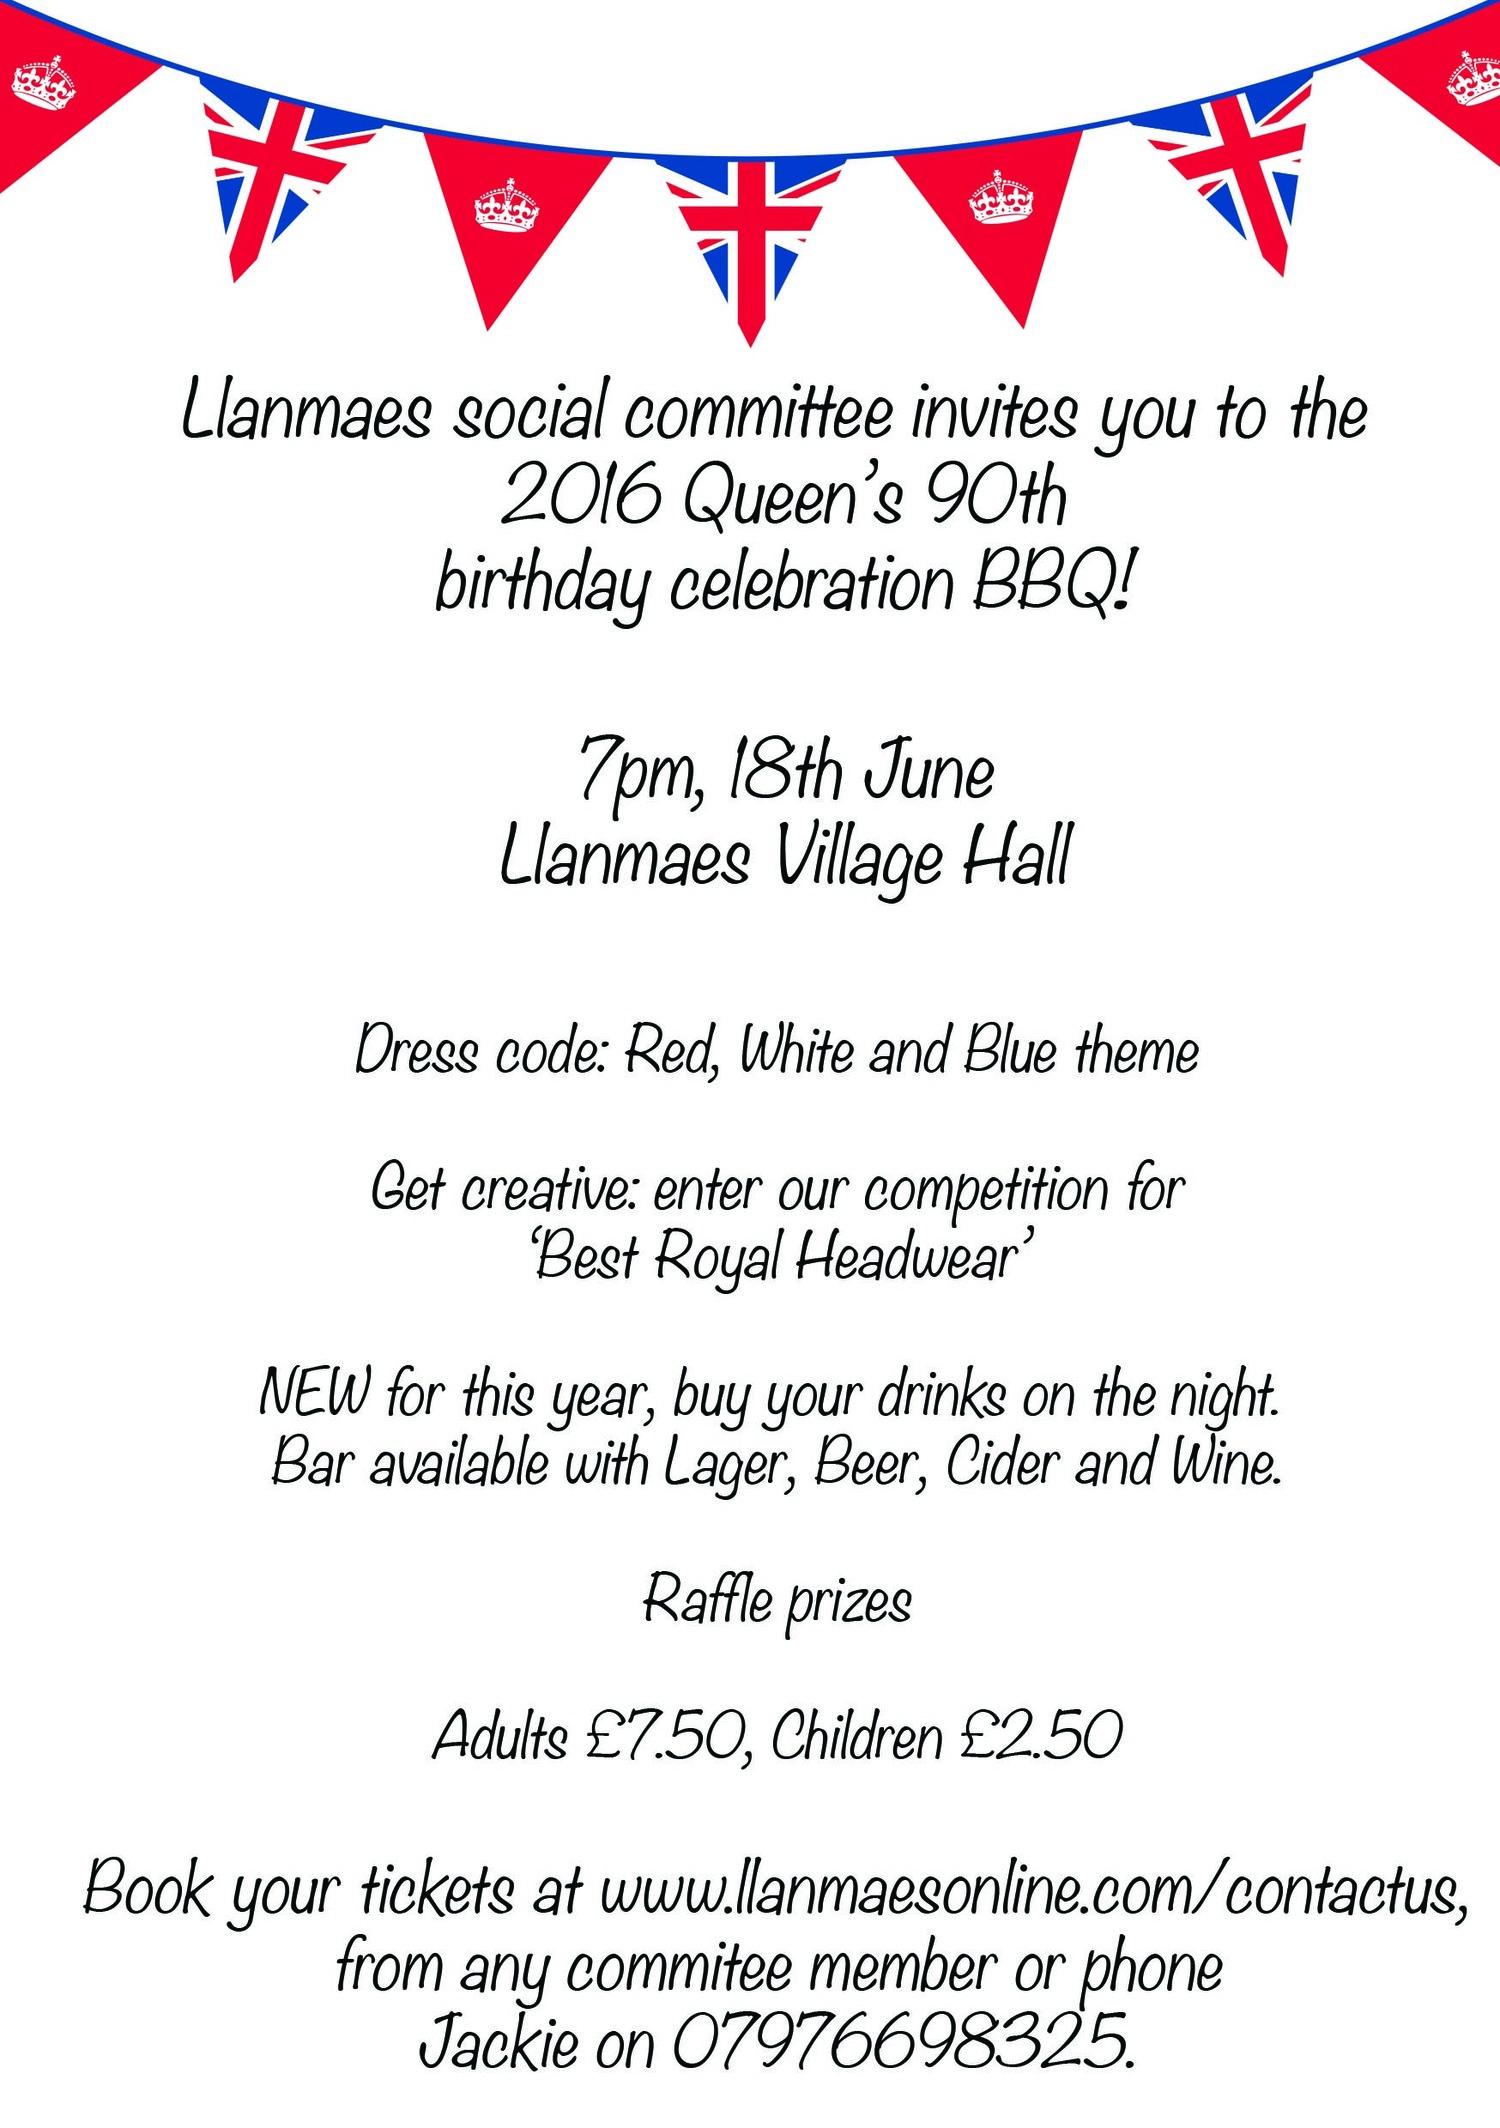 Llanmaes Queens 90th Birthday Celebration BBQ Online